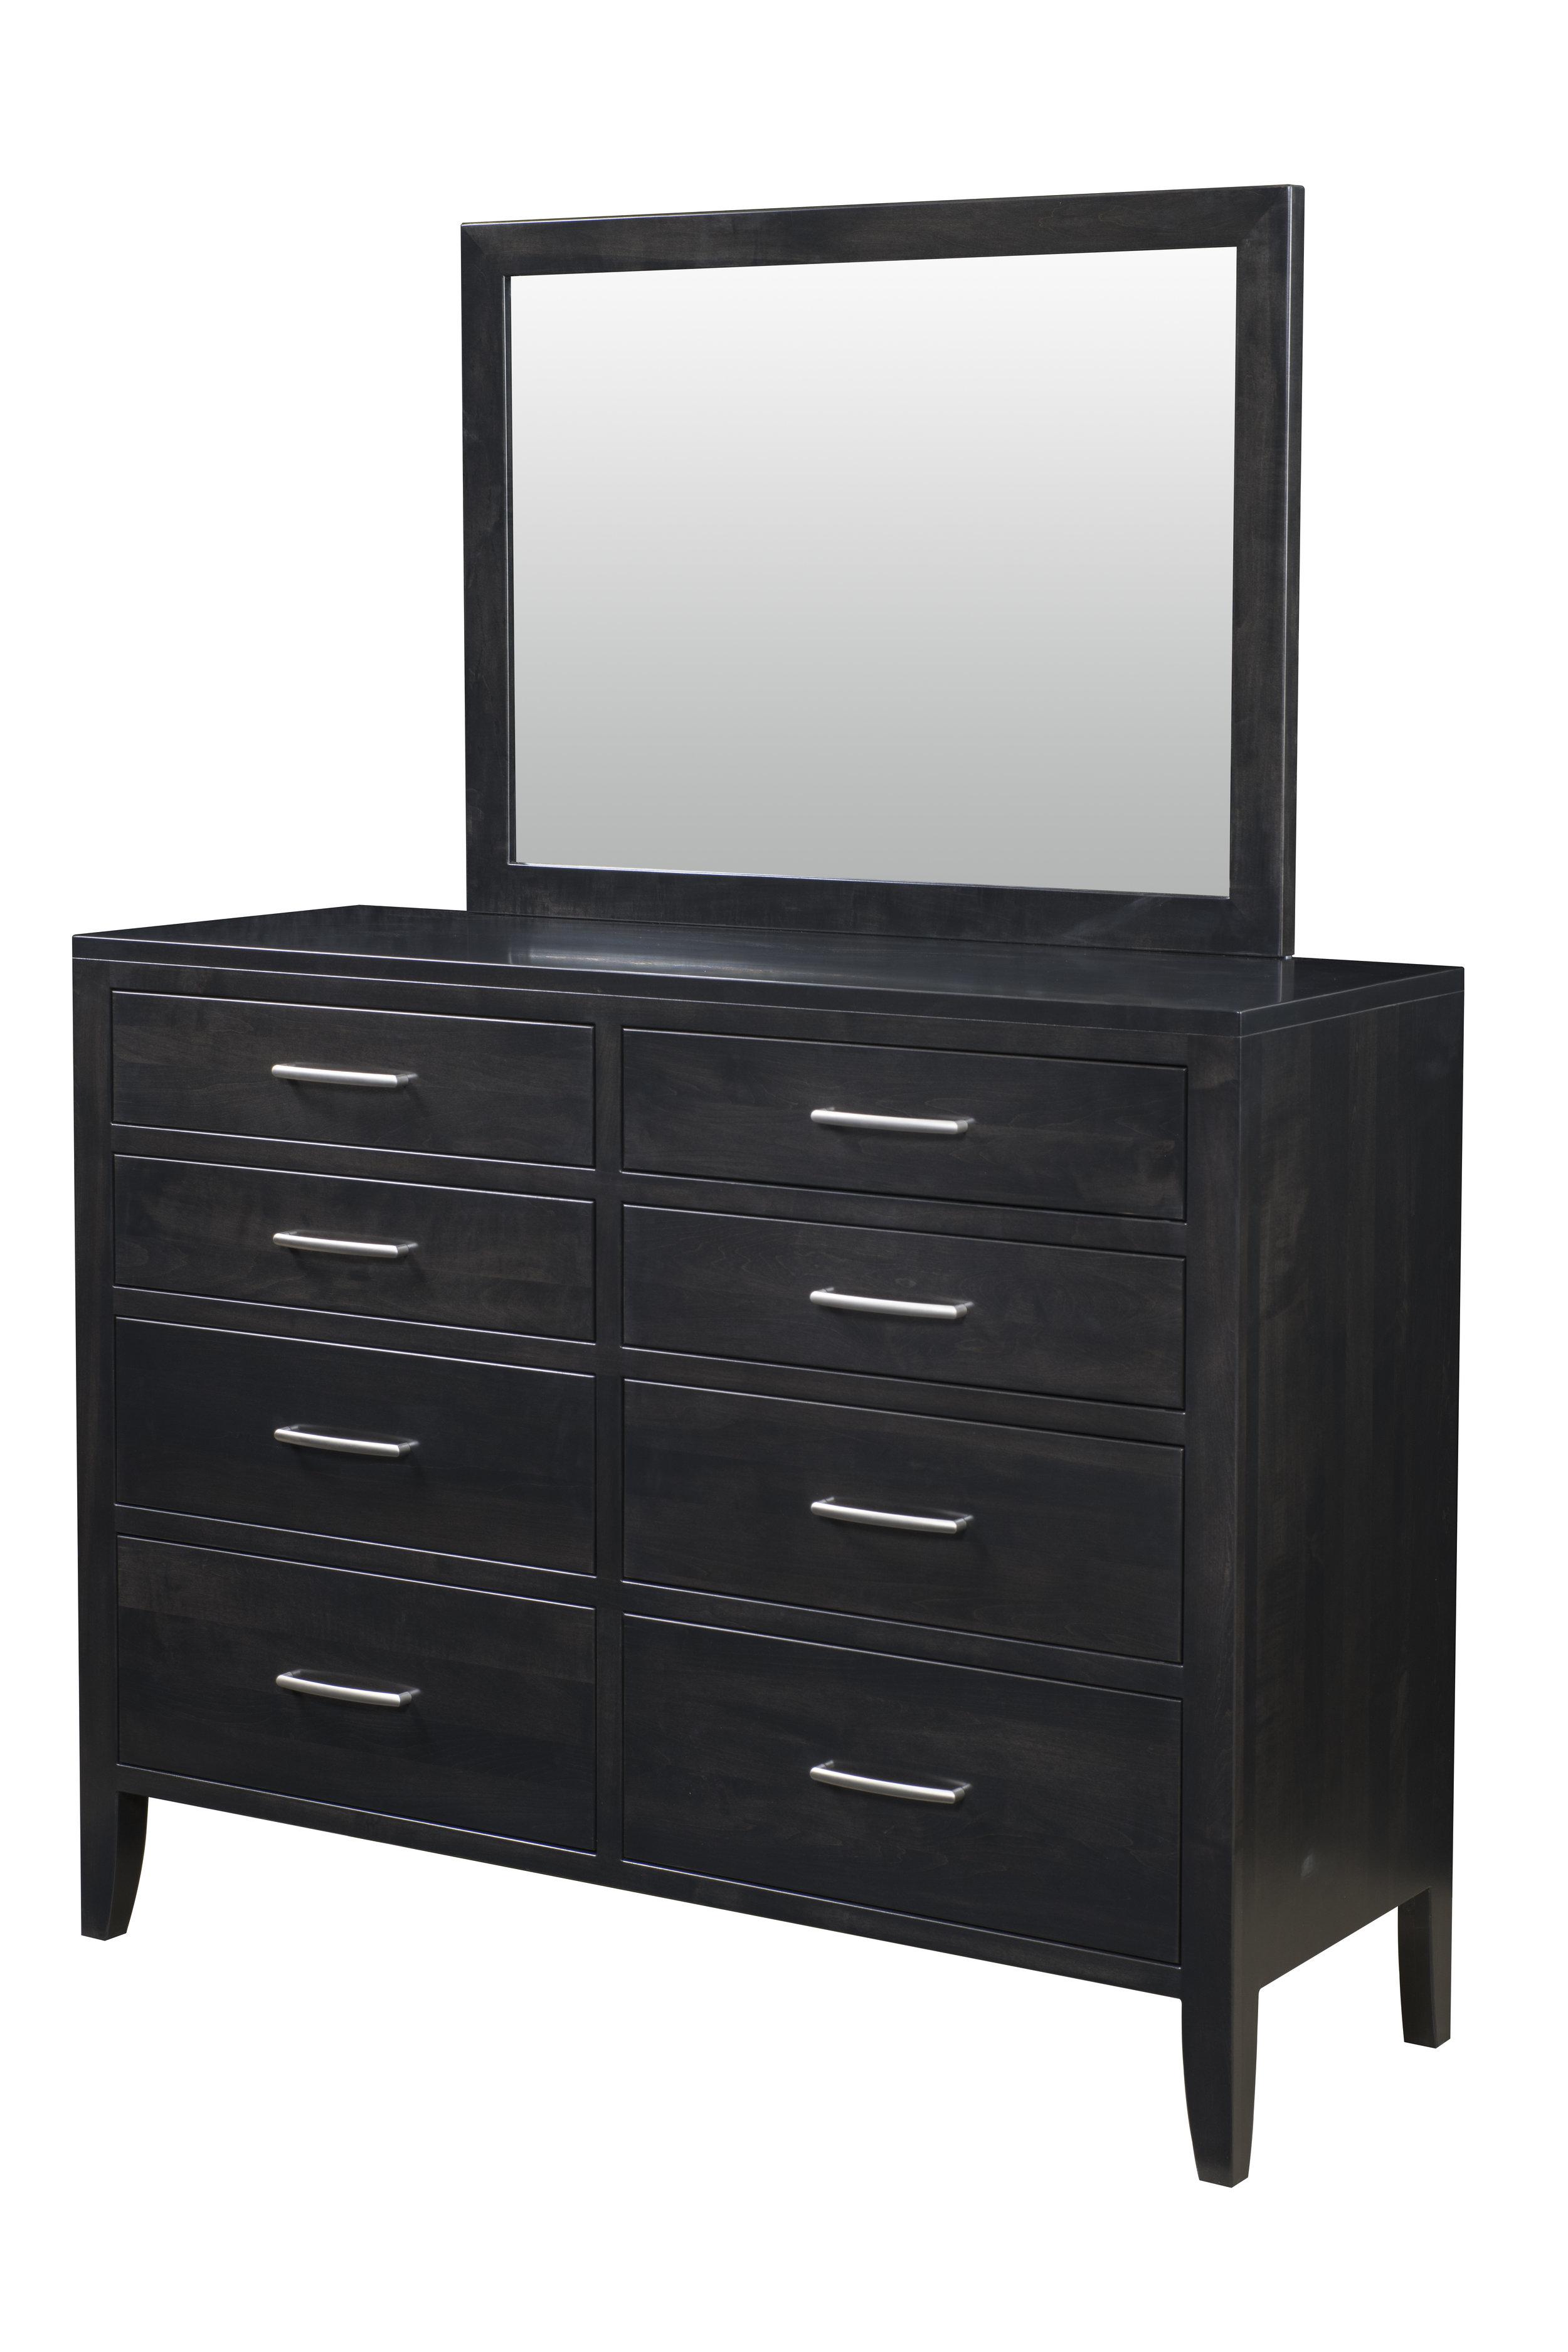 BR-1360 Dresser wMI-1632.jpg